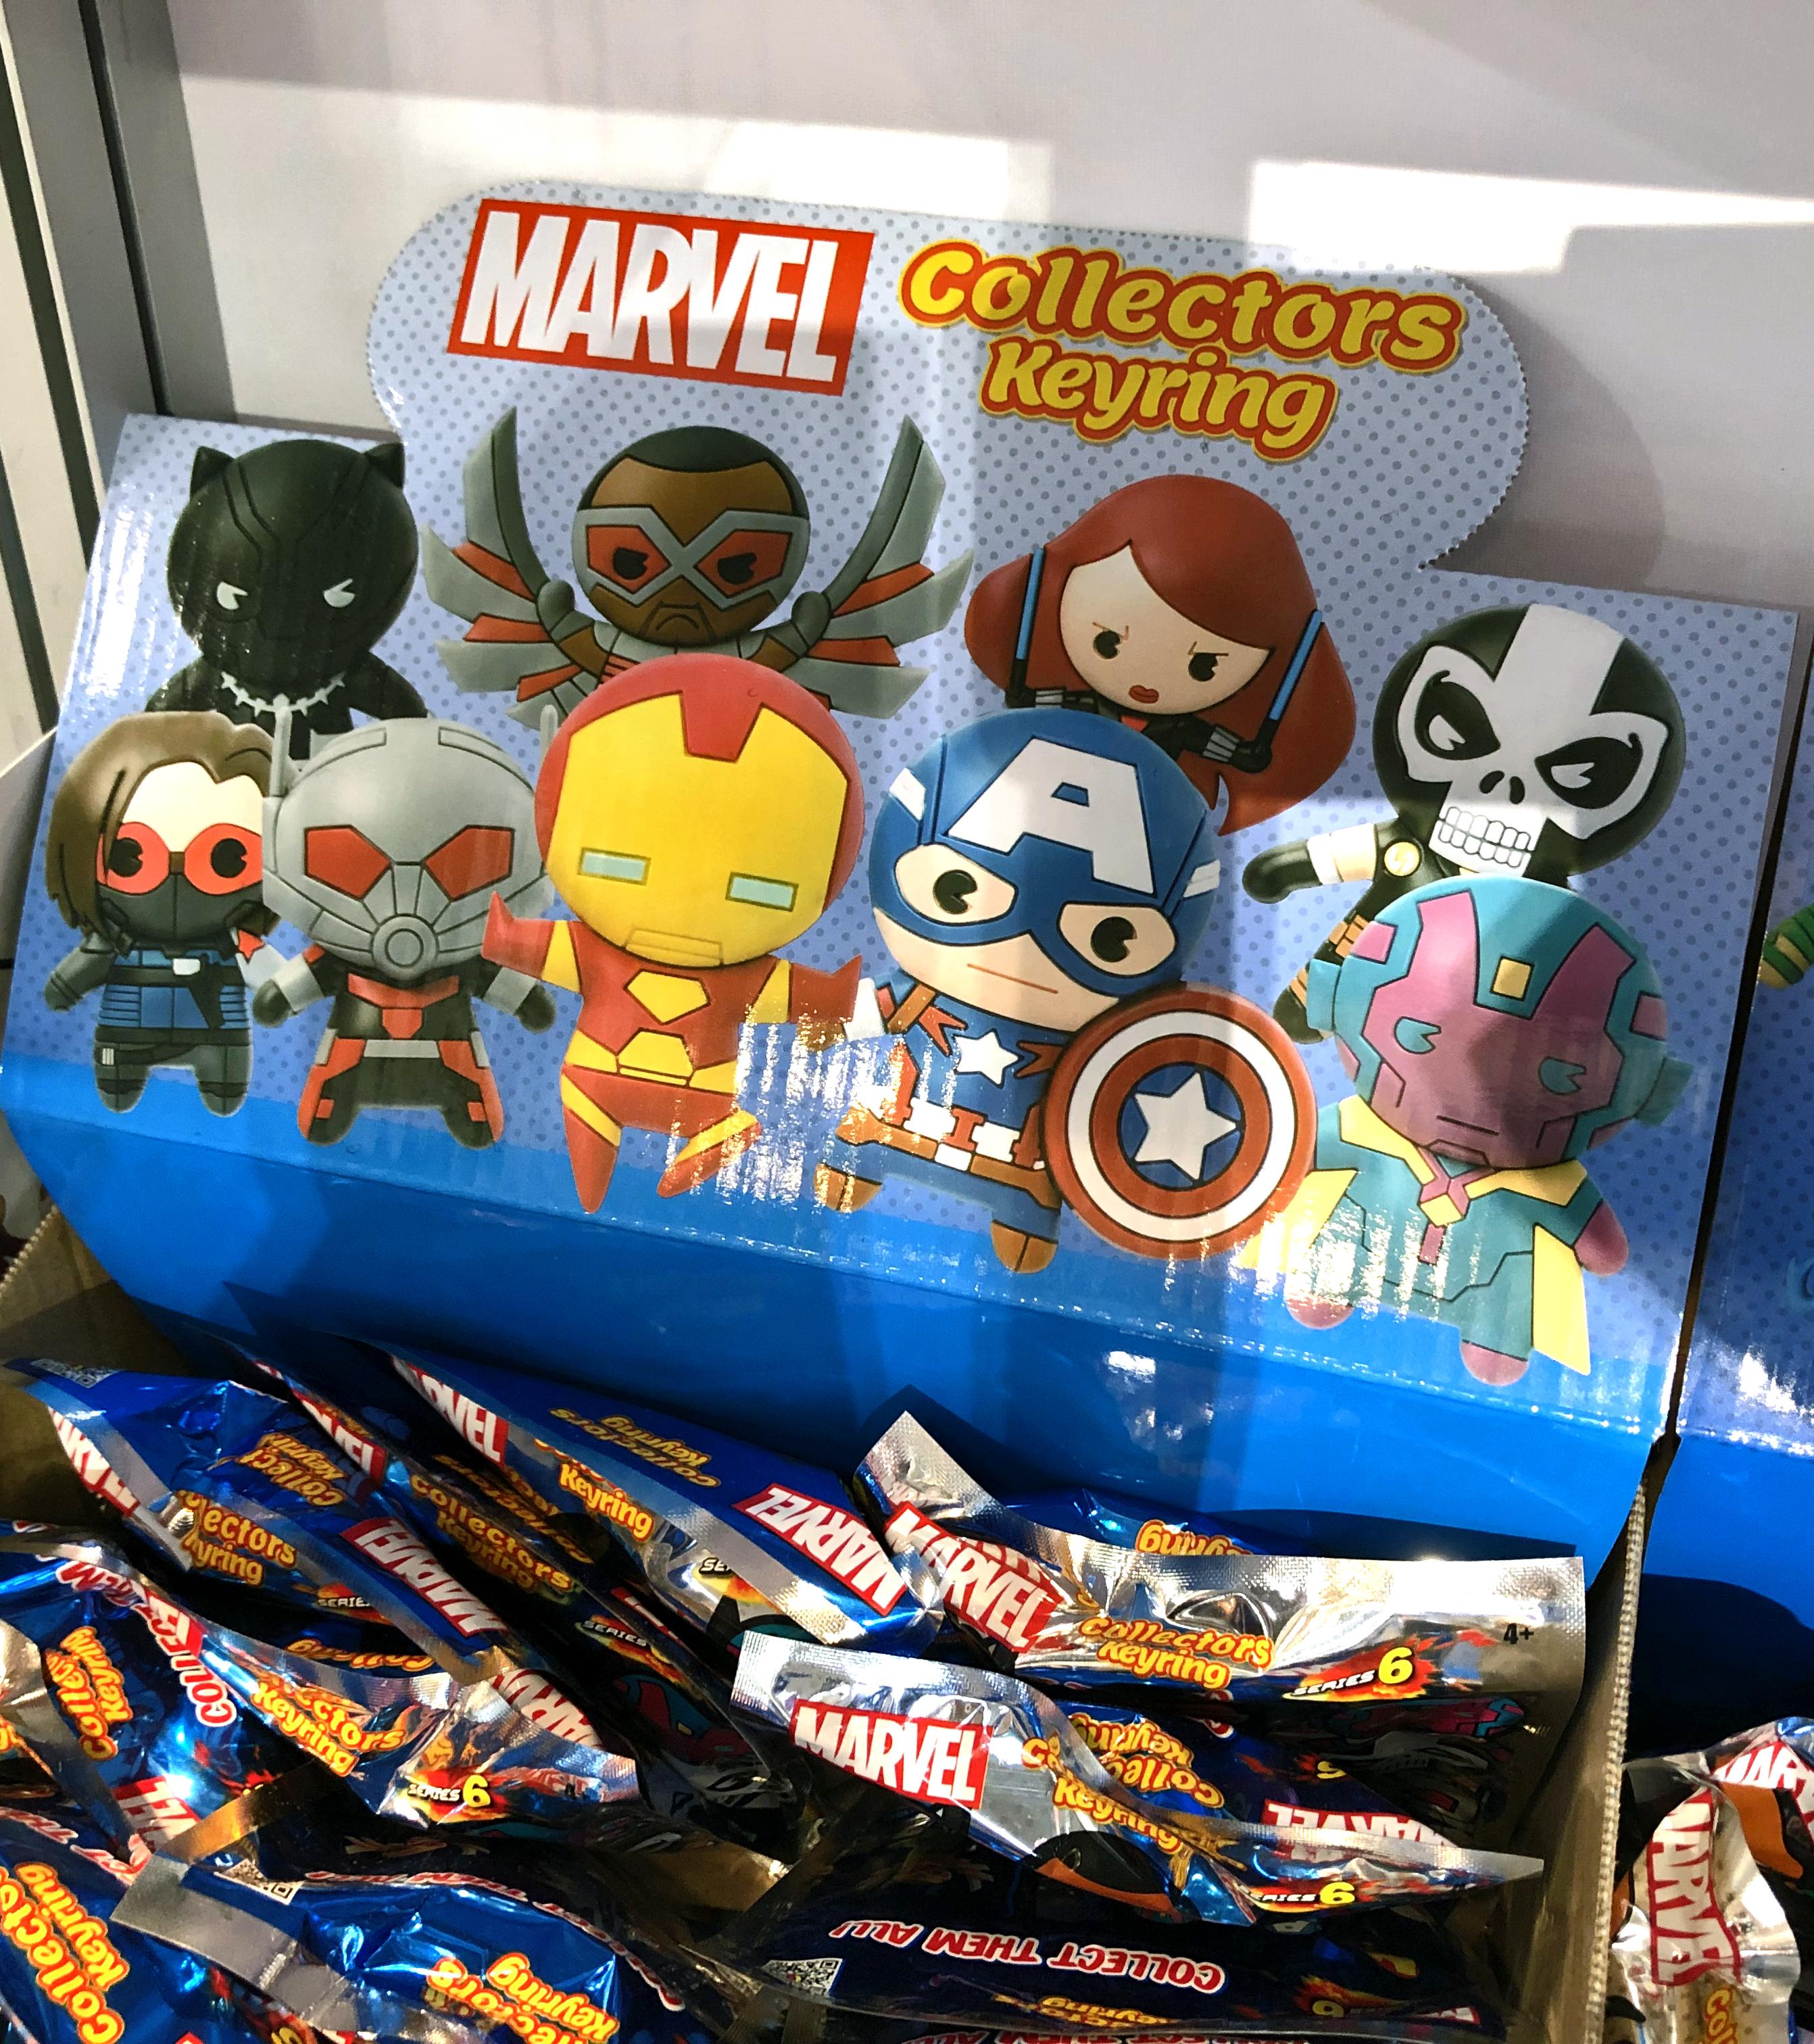 2018 Toy Fair Monogram International MARVEL Collectors Keyrings 01